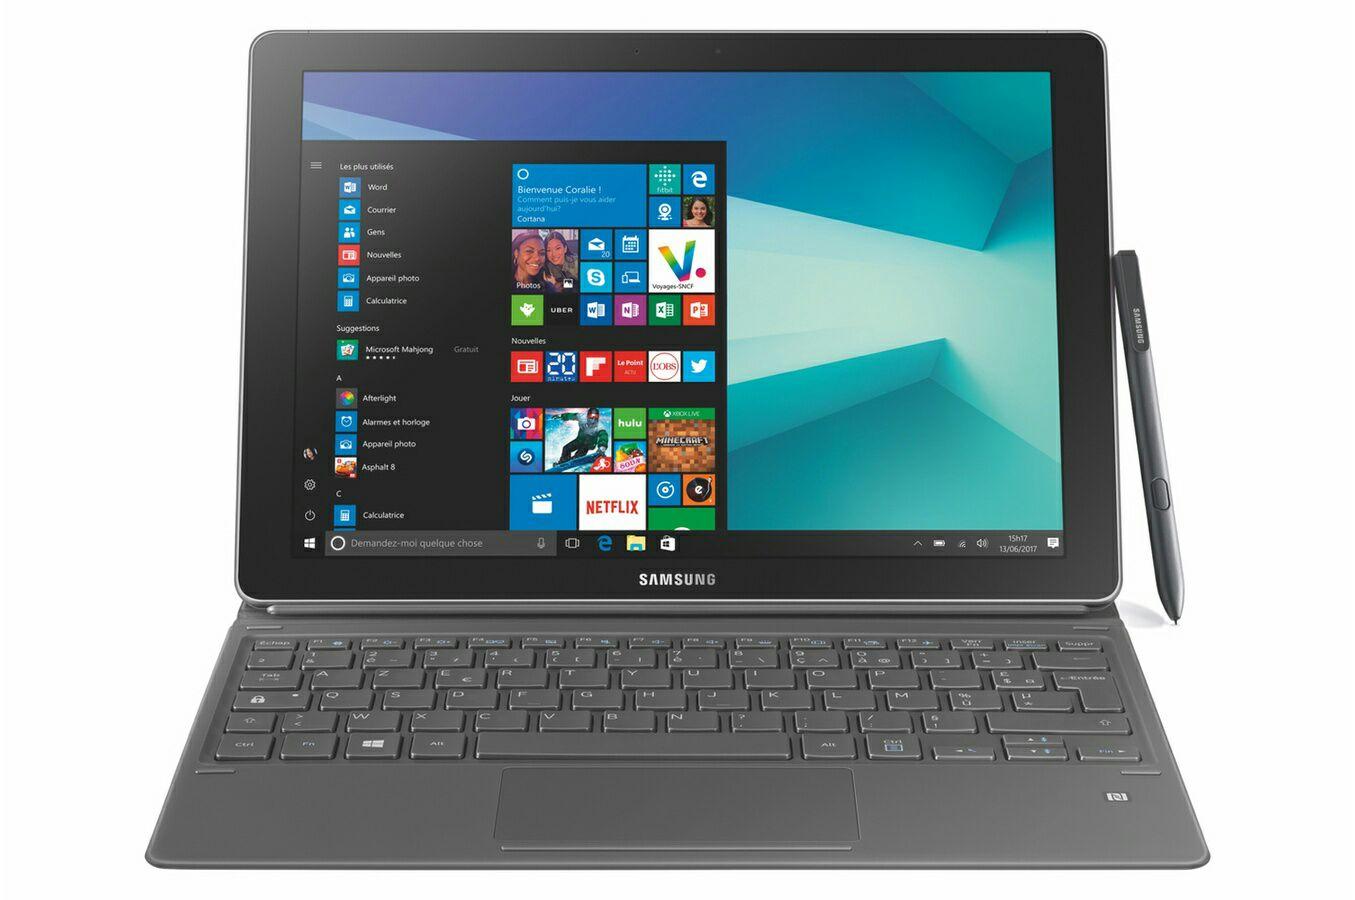 "PC Hybride 2-en-1 12"" Samsung Galaxy Book - Full HD+, i5-7200,  RAM 4 Go, SSD 128 Go, Windows 10 Pro + Google Home Mini (via ODR de 150€)"